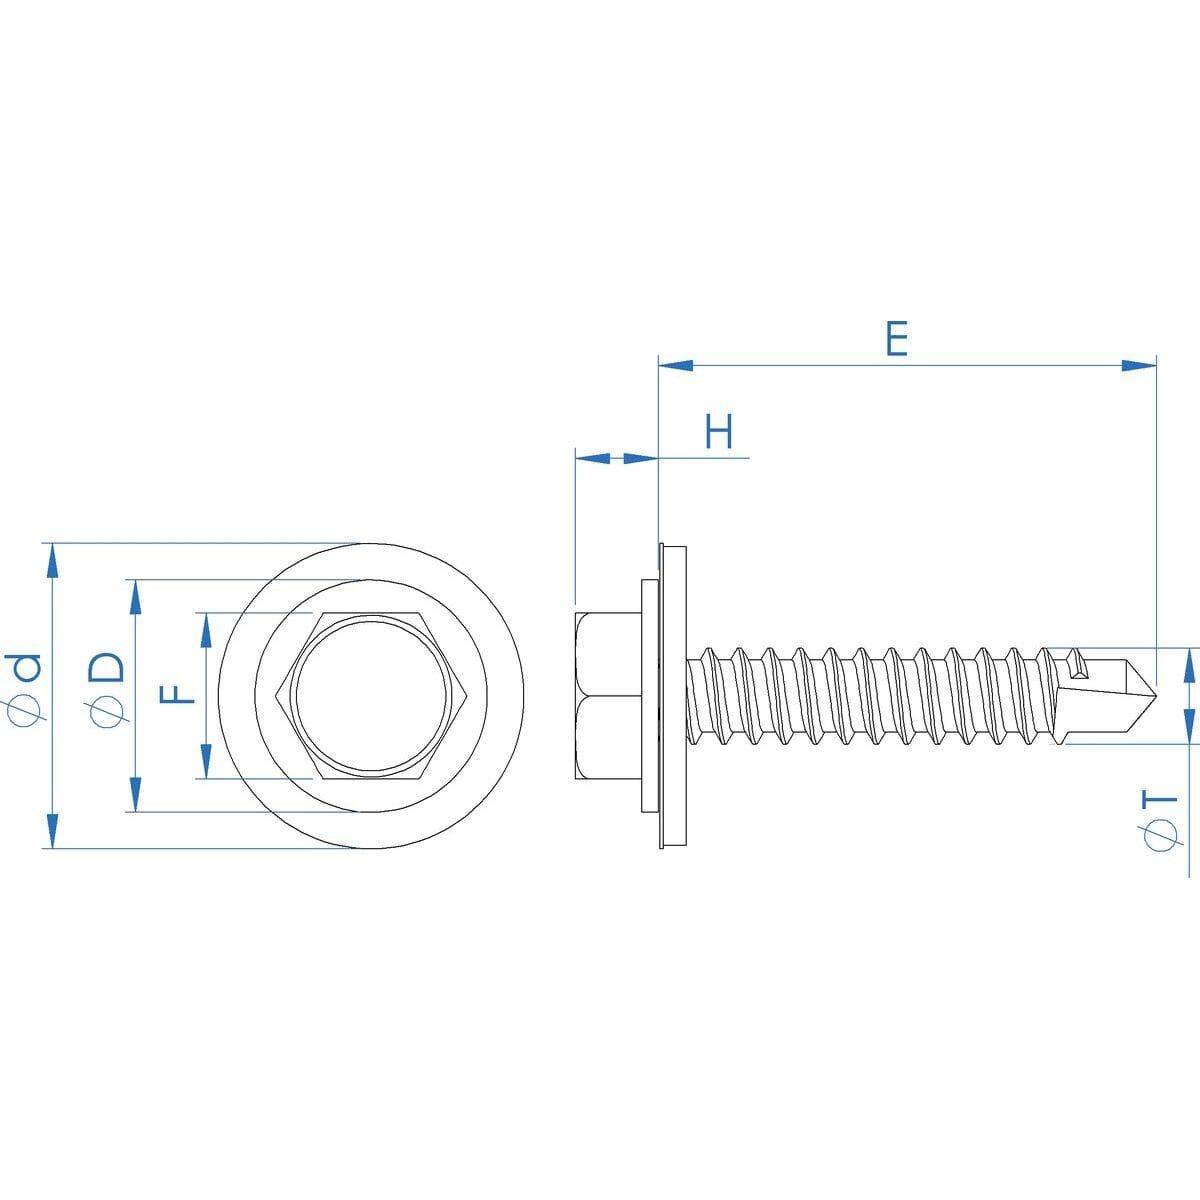 No.12 (5.5mm) x 32mm Sealing Self Drilling Hexagon Tek Screws (DIN 7504K) - Stainless Steel (A2) Drawing